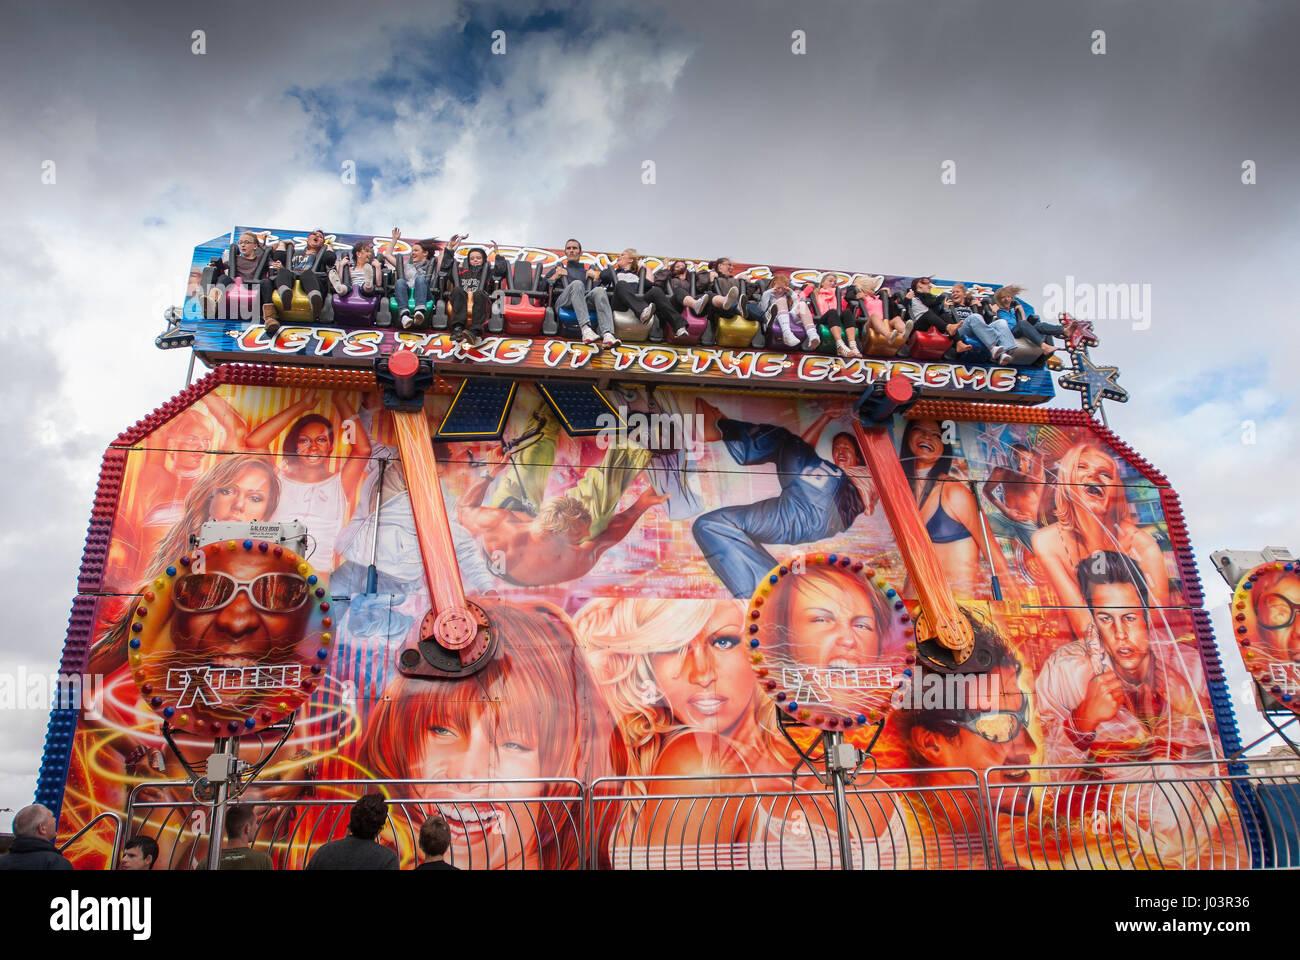 Faurground ride at Blackpool. - Stock Image